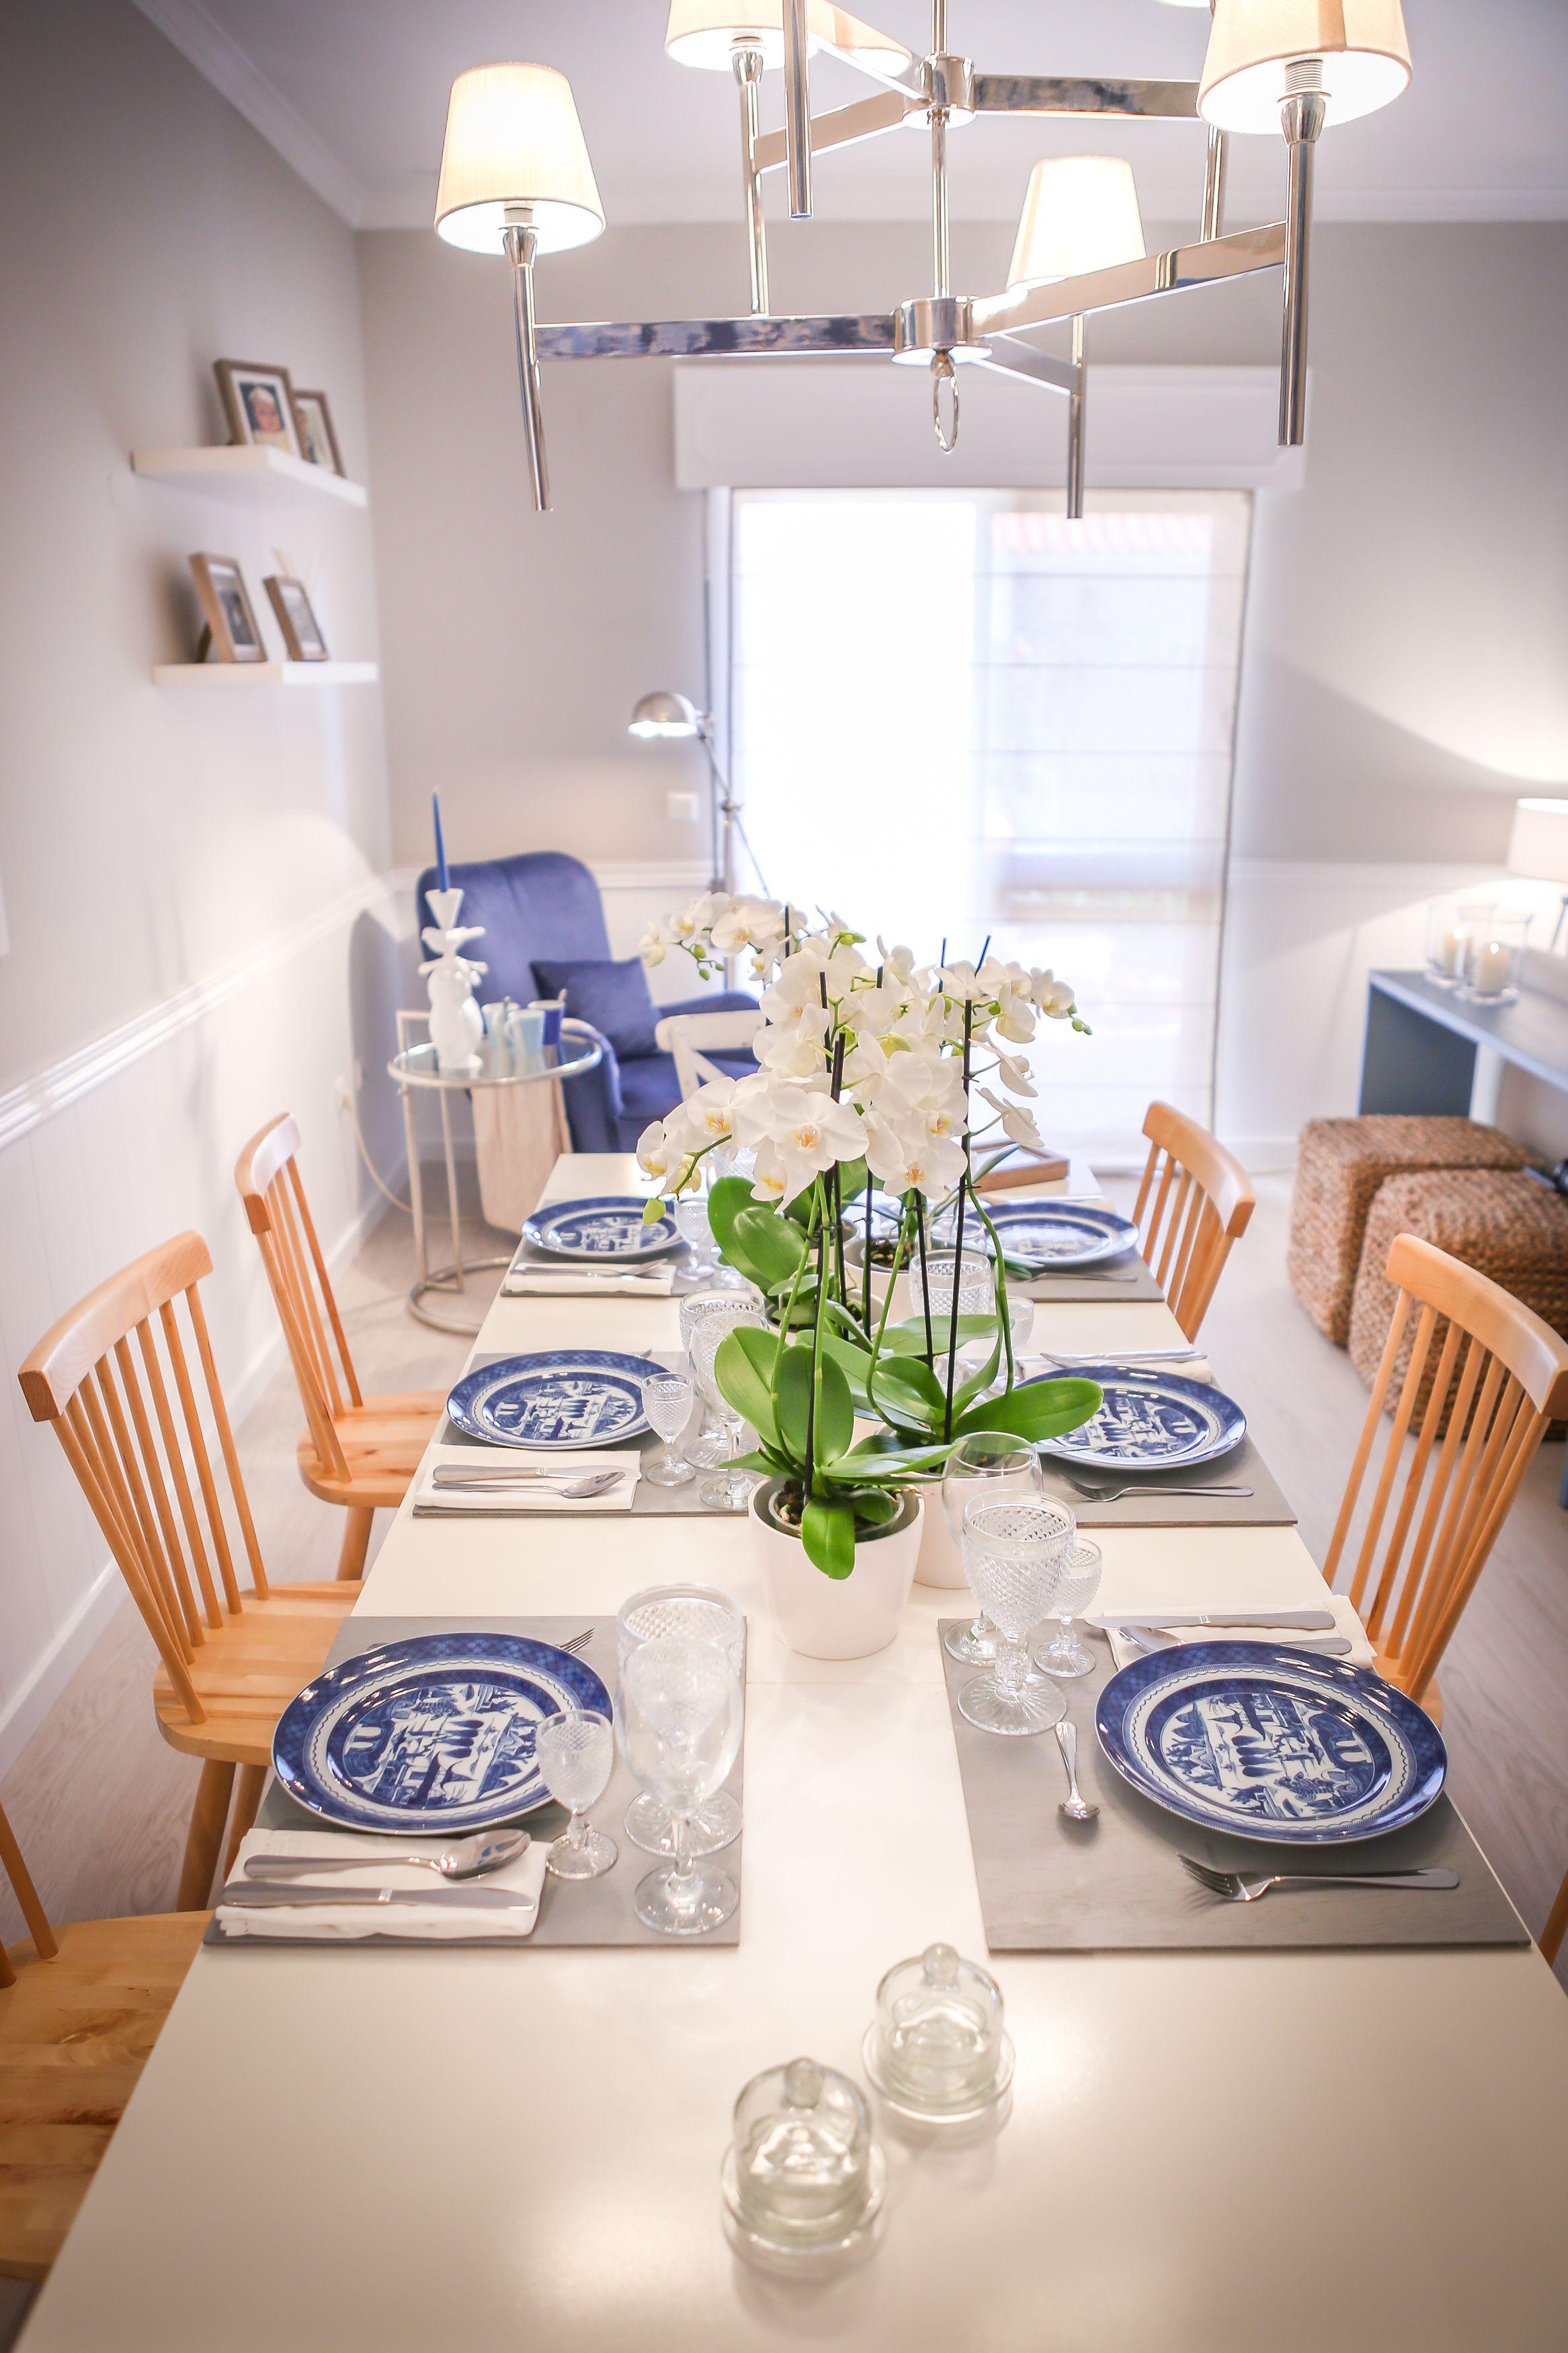 Isabel pires de lima sala de jantar dining room for Casa minimalista lima